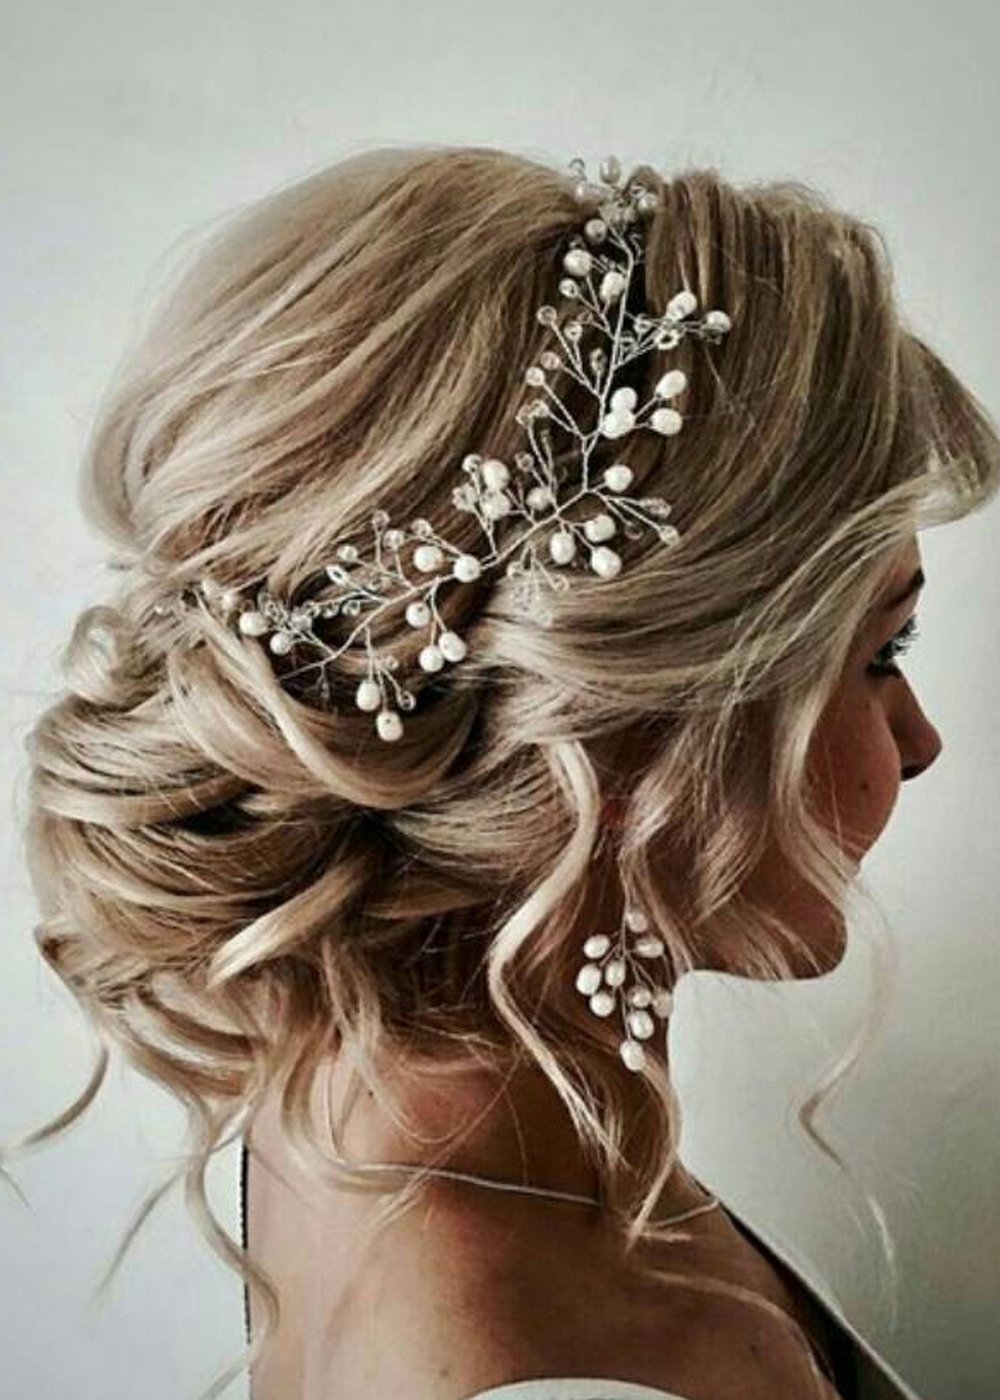 Yean Wedding Long Hair Vine Flower Silver Bridal Headband for Bride and 100cm